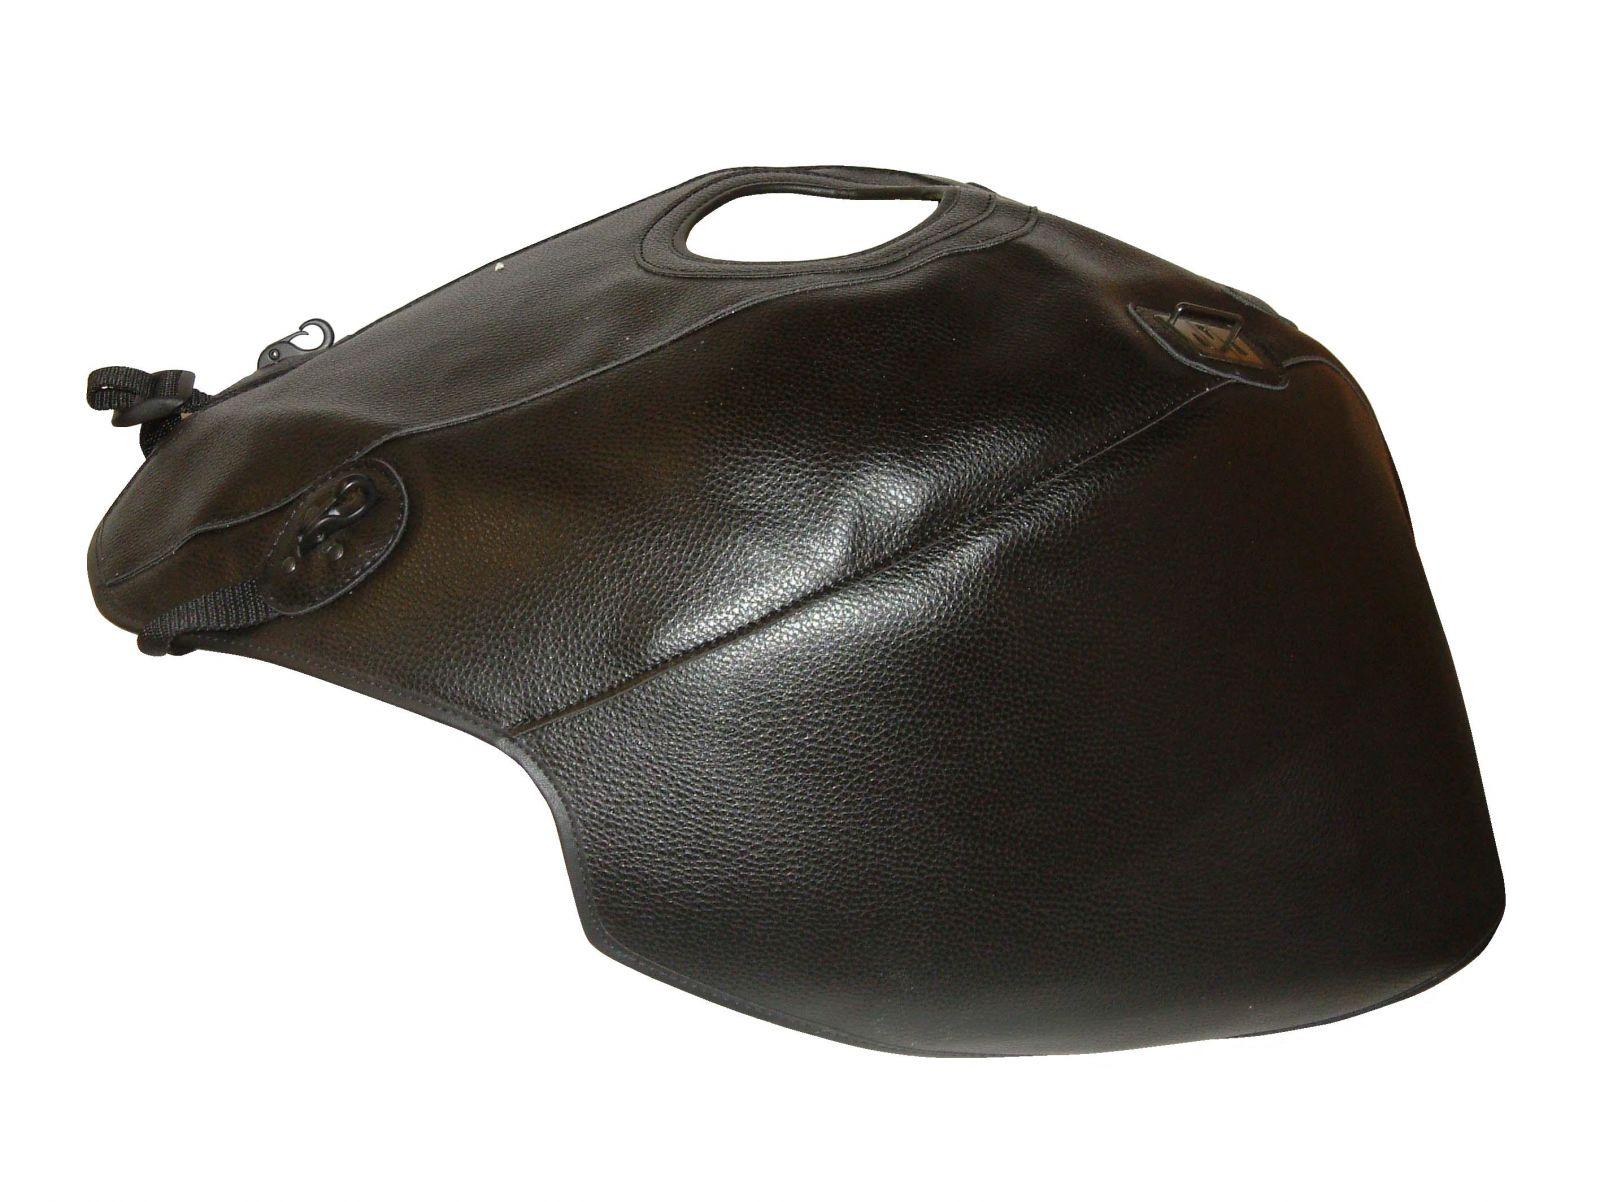 Capa de depósito TPR3854 - HONDA CBR 600 F [1999-2007]